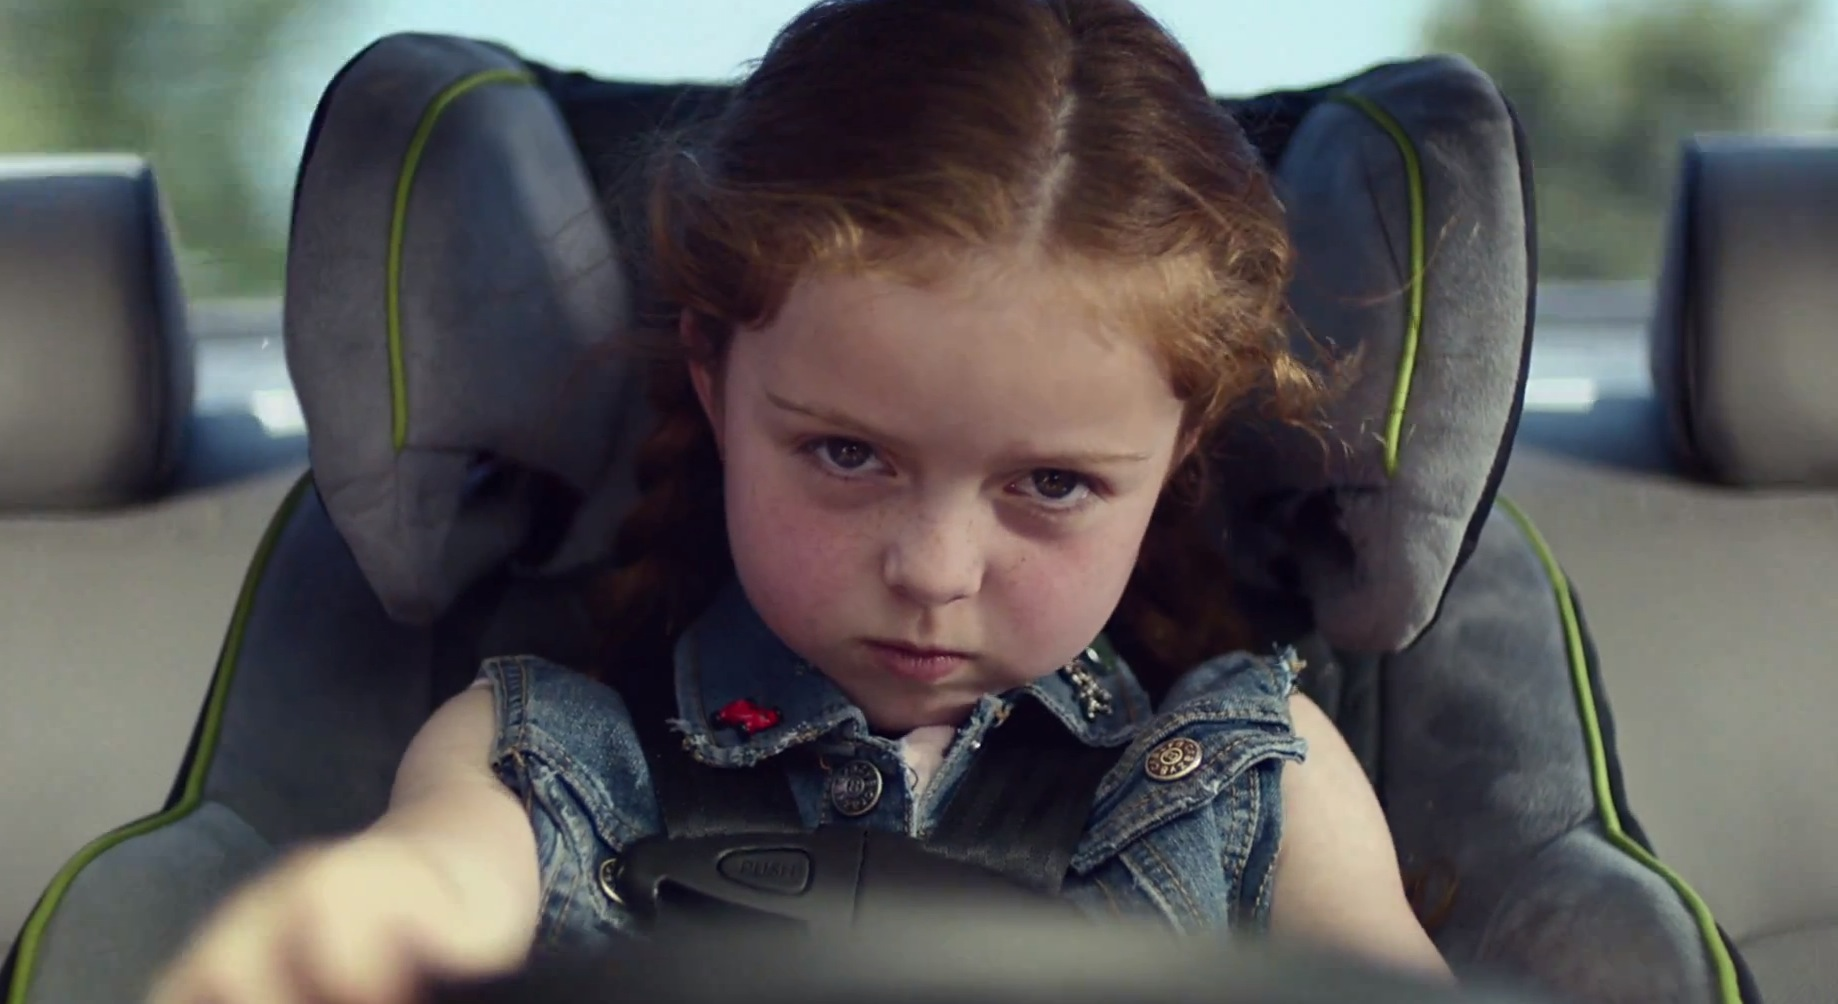 Quảng cáo cực fun về Hyundai Sonata 2015